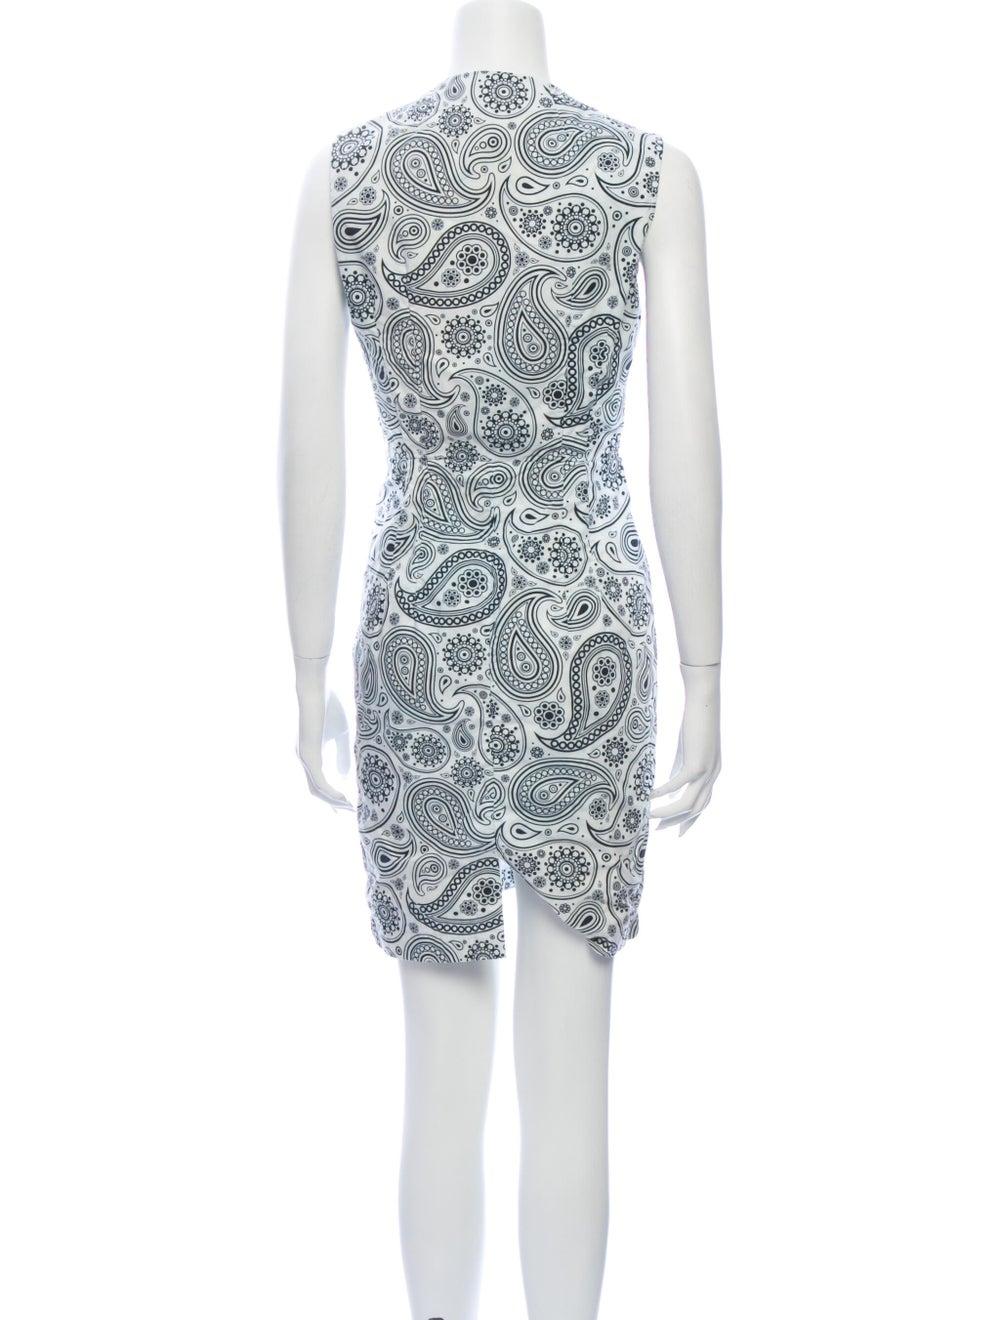 Jil Sander Paisley Print Mini Dress White - image 3